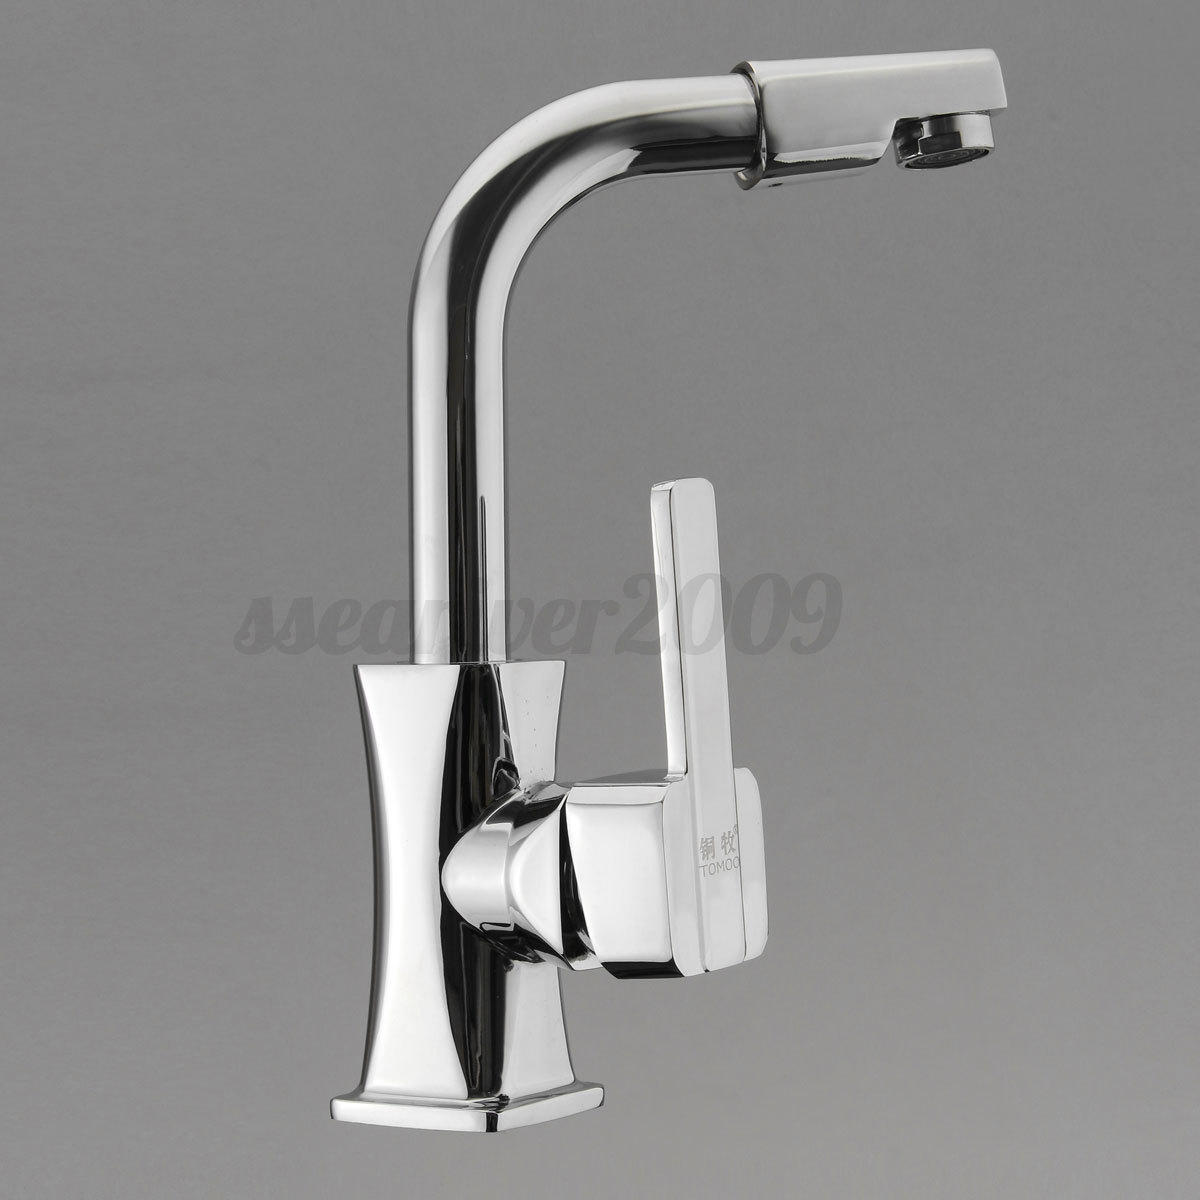 Spring Sink Mixer Tap Kitchen Pull Down Swivel Spray Spout